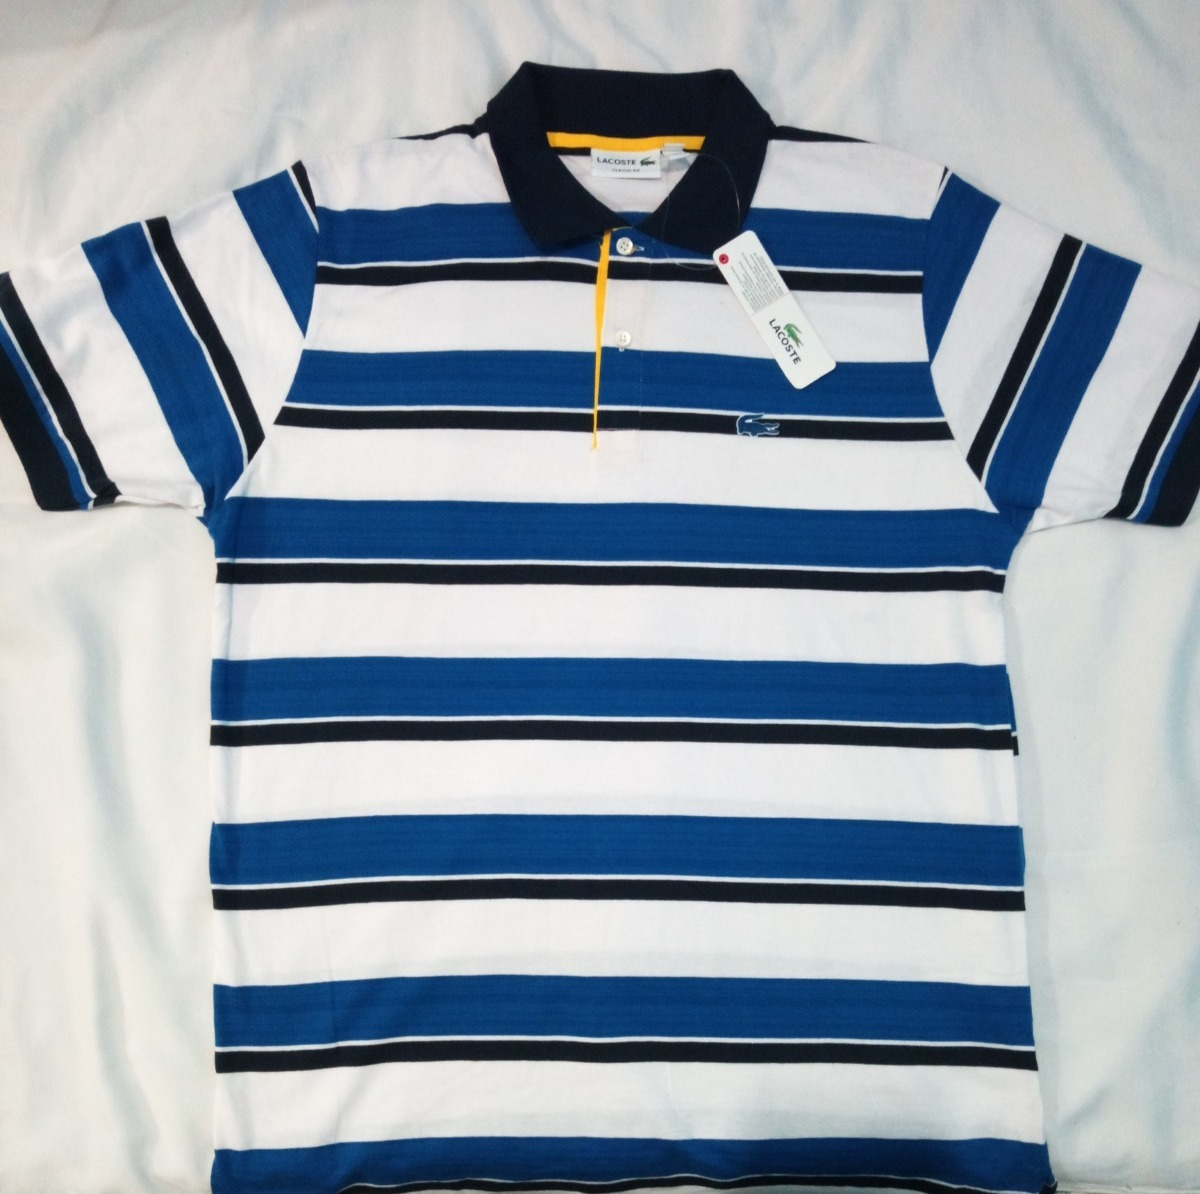 Camisa Polo Lacoste Logo Emborrachado Masculino Top - R  149,99 em ... d6542c0447